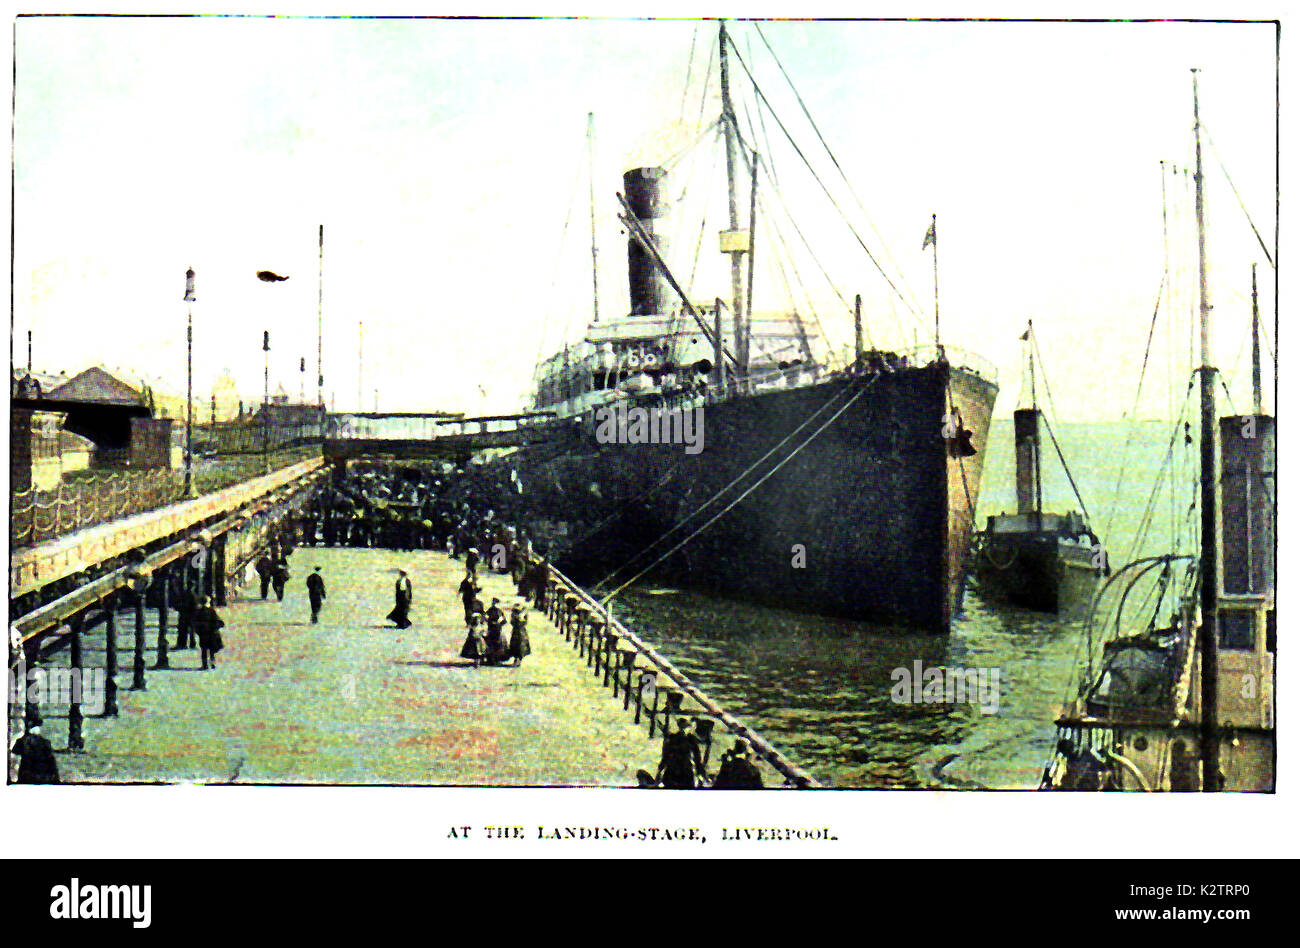 1925 - Steam passenger vessel and tugs at a Liverpool (UK) landing stage UK (engineer John James Webster) - Stock Image